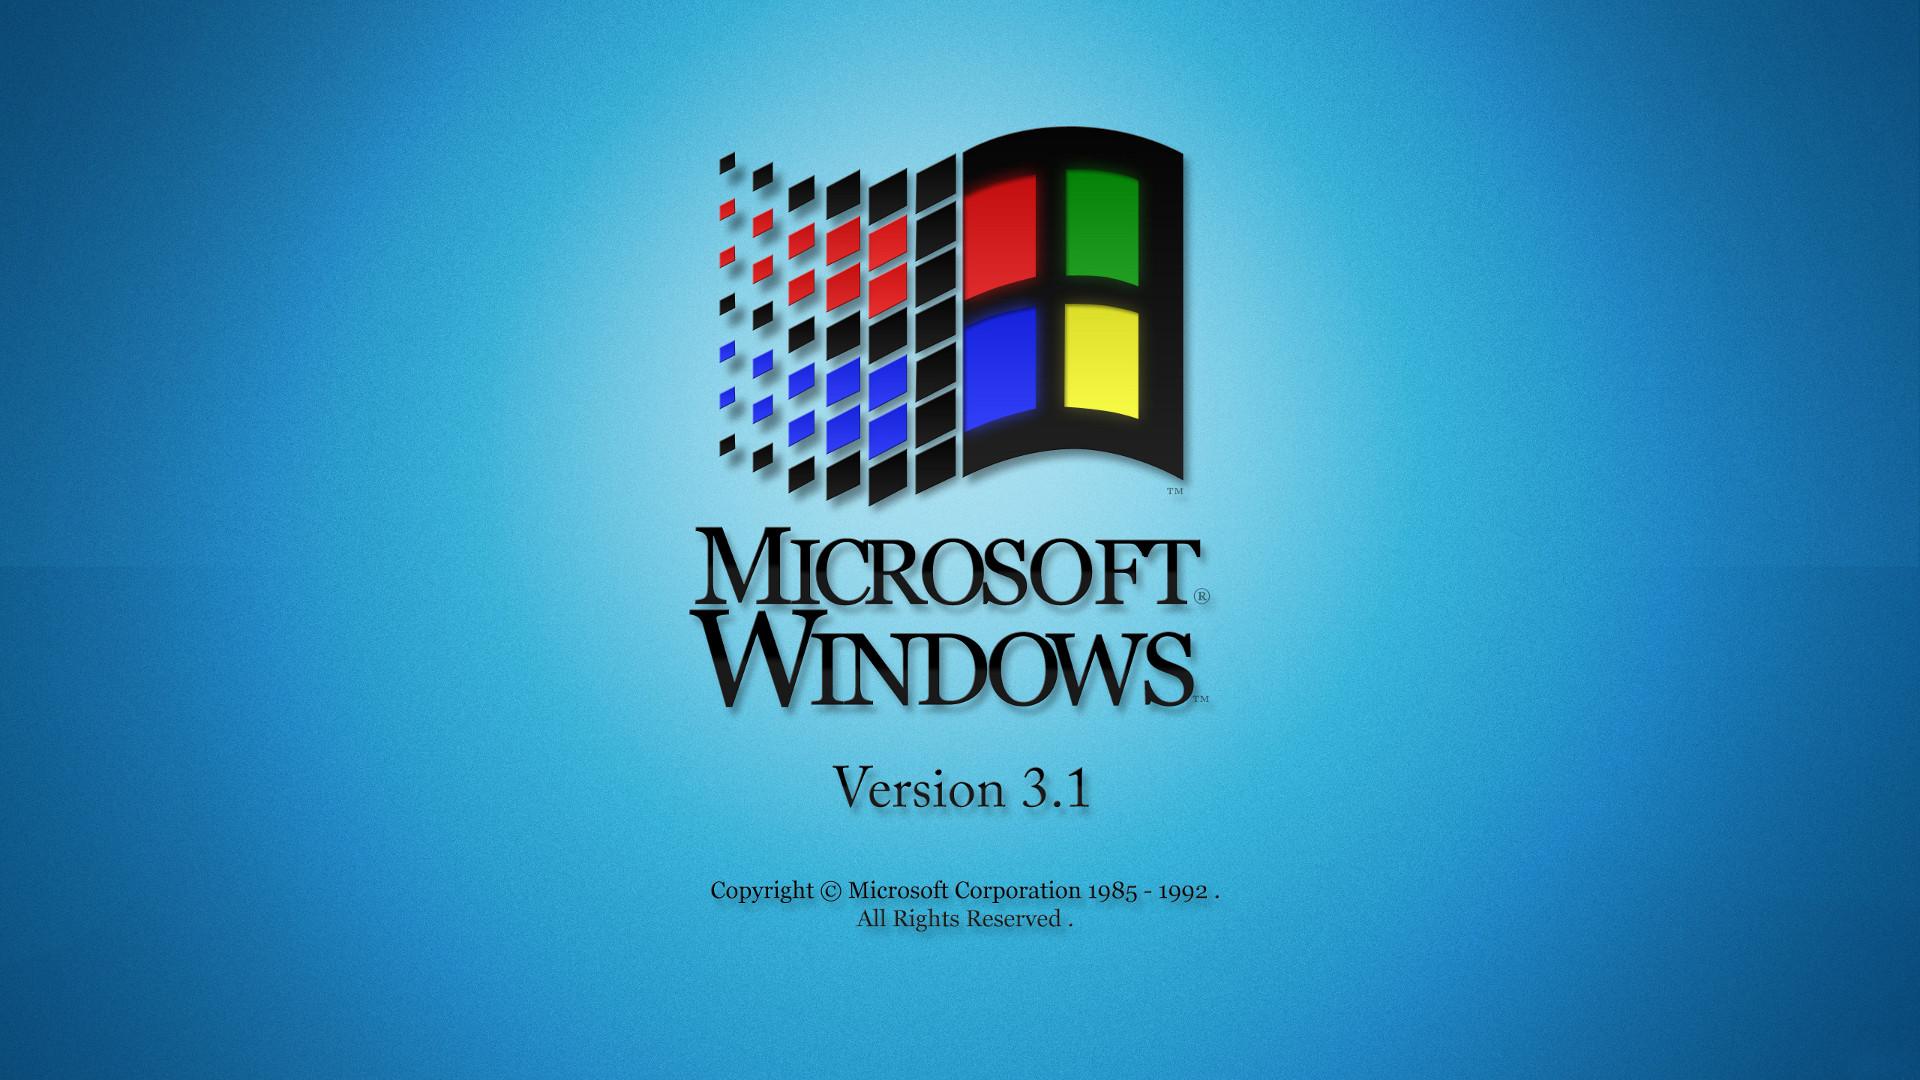 Microsoft Windows Version 3.1 desktop PC and Mac wallpaper